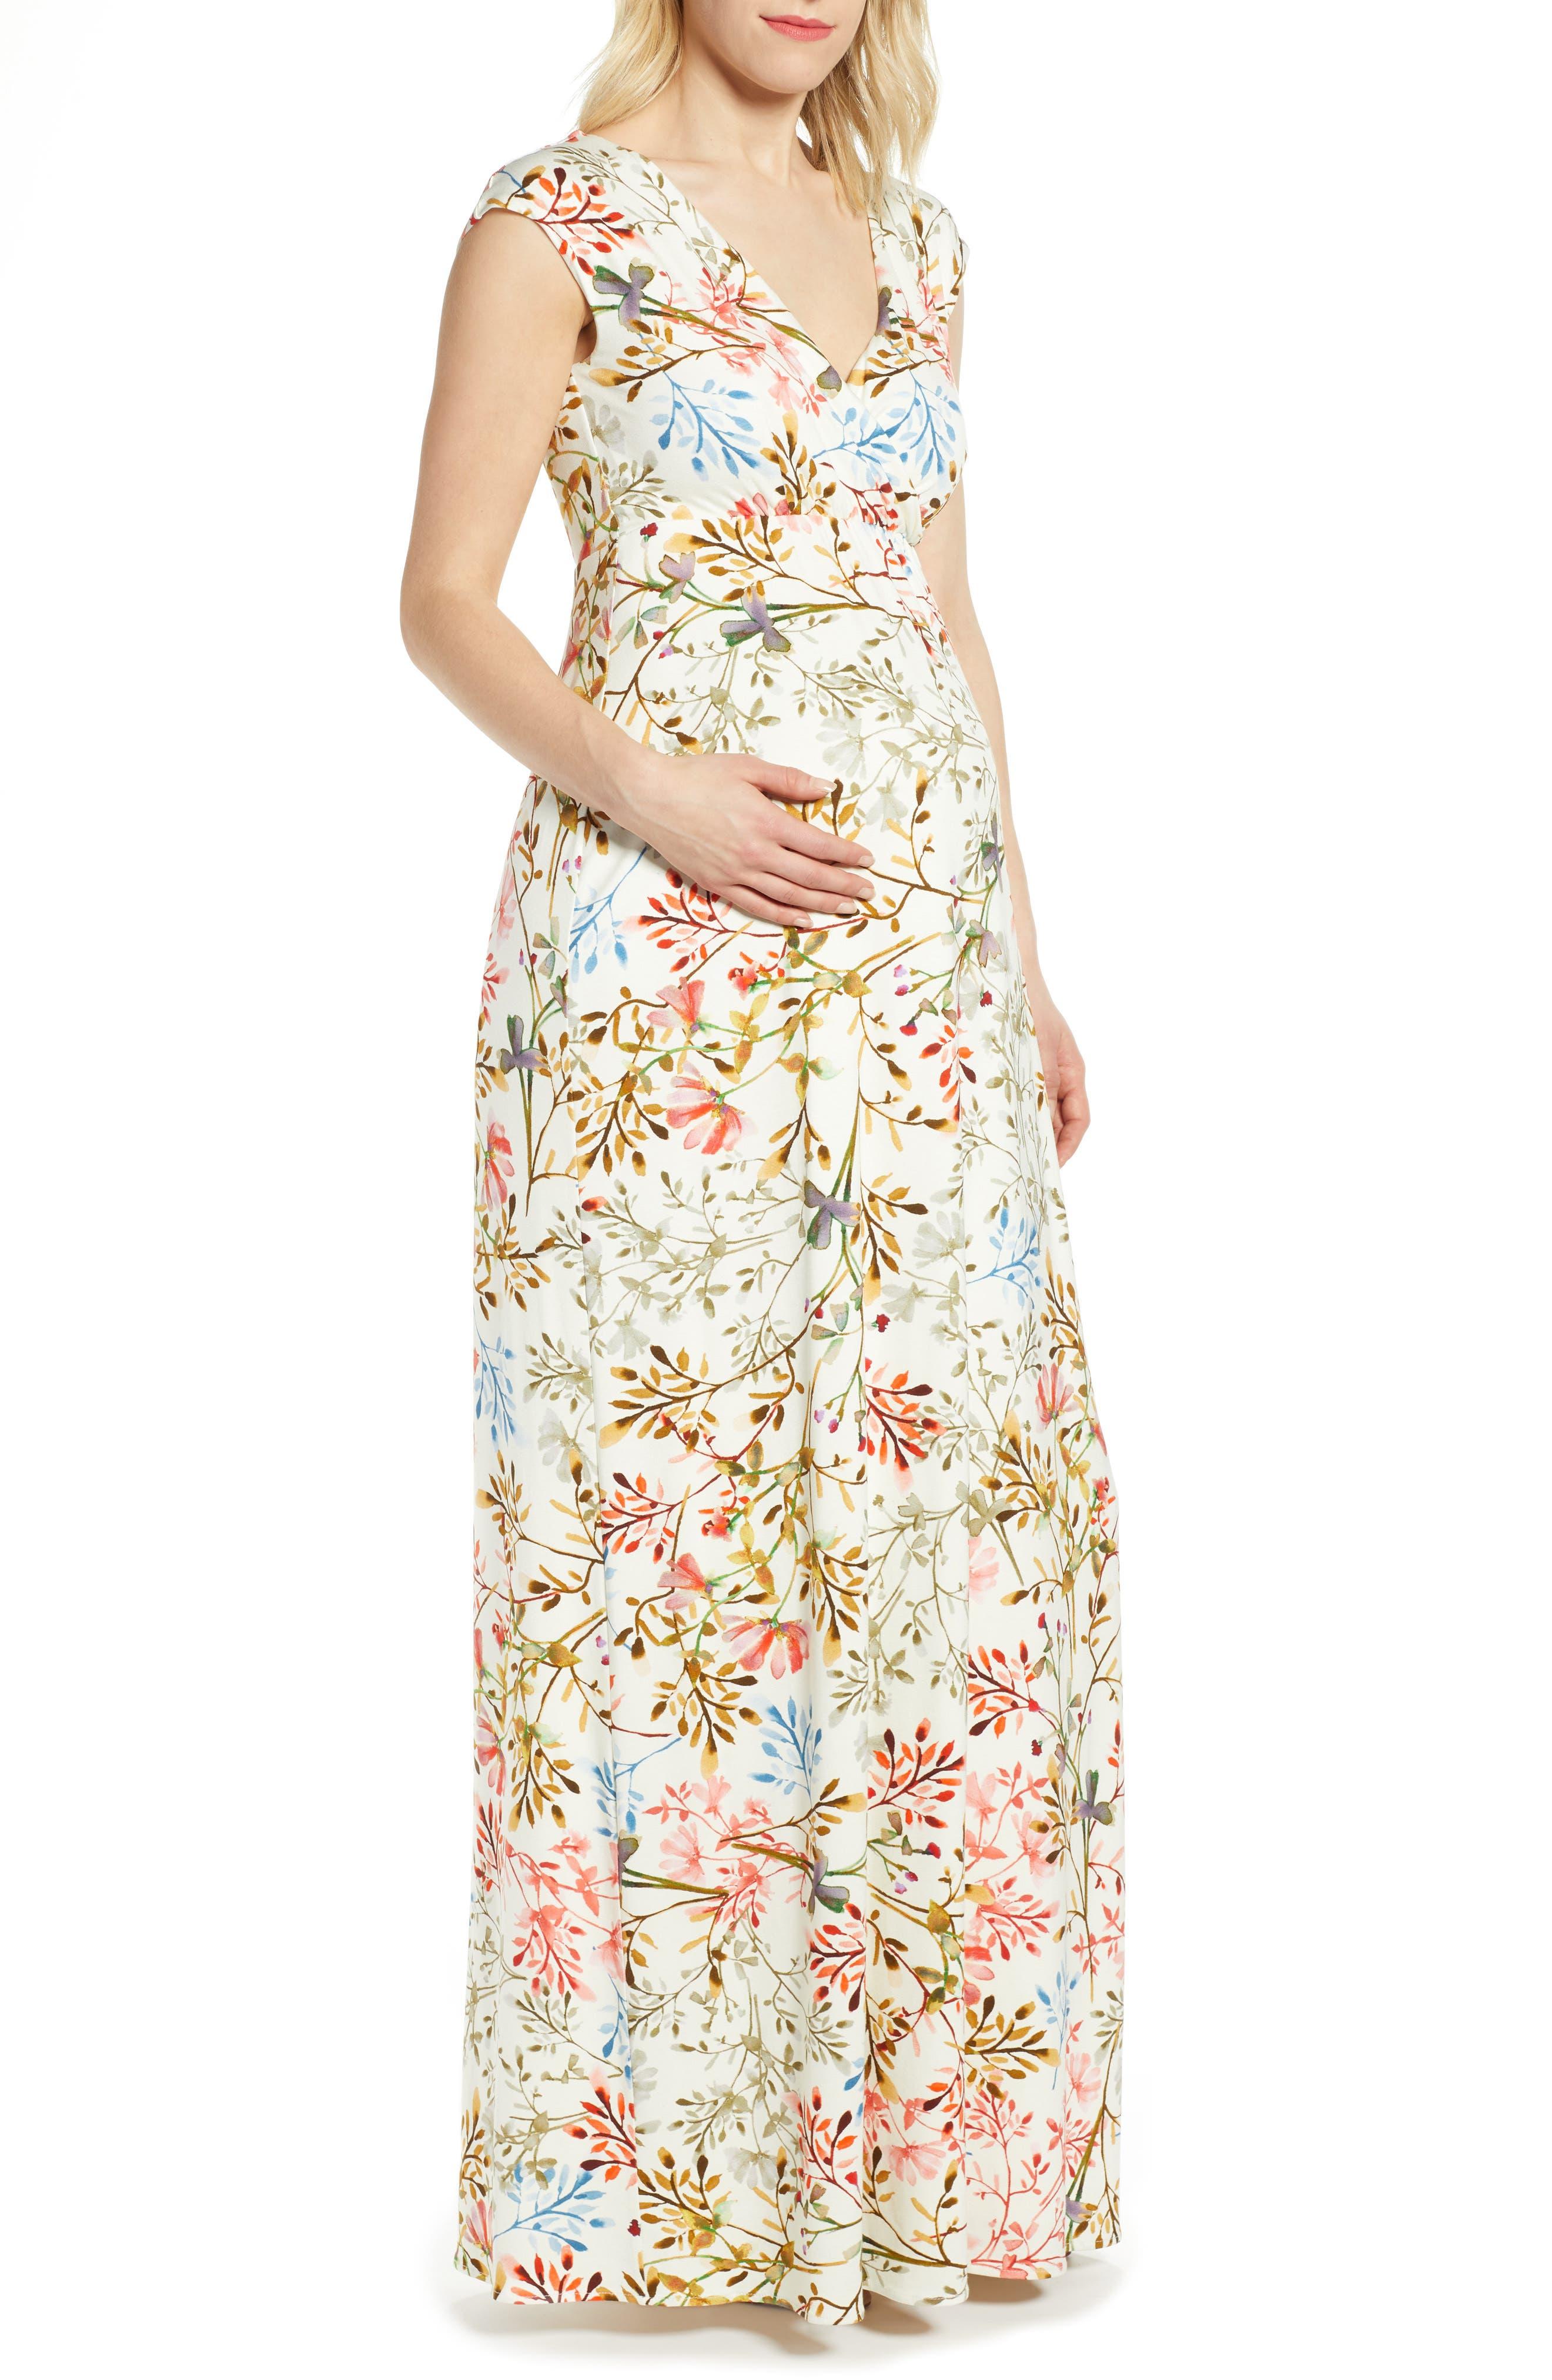 Tiffany Rose Alana Maternity/nursing Maxi Dress, White